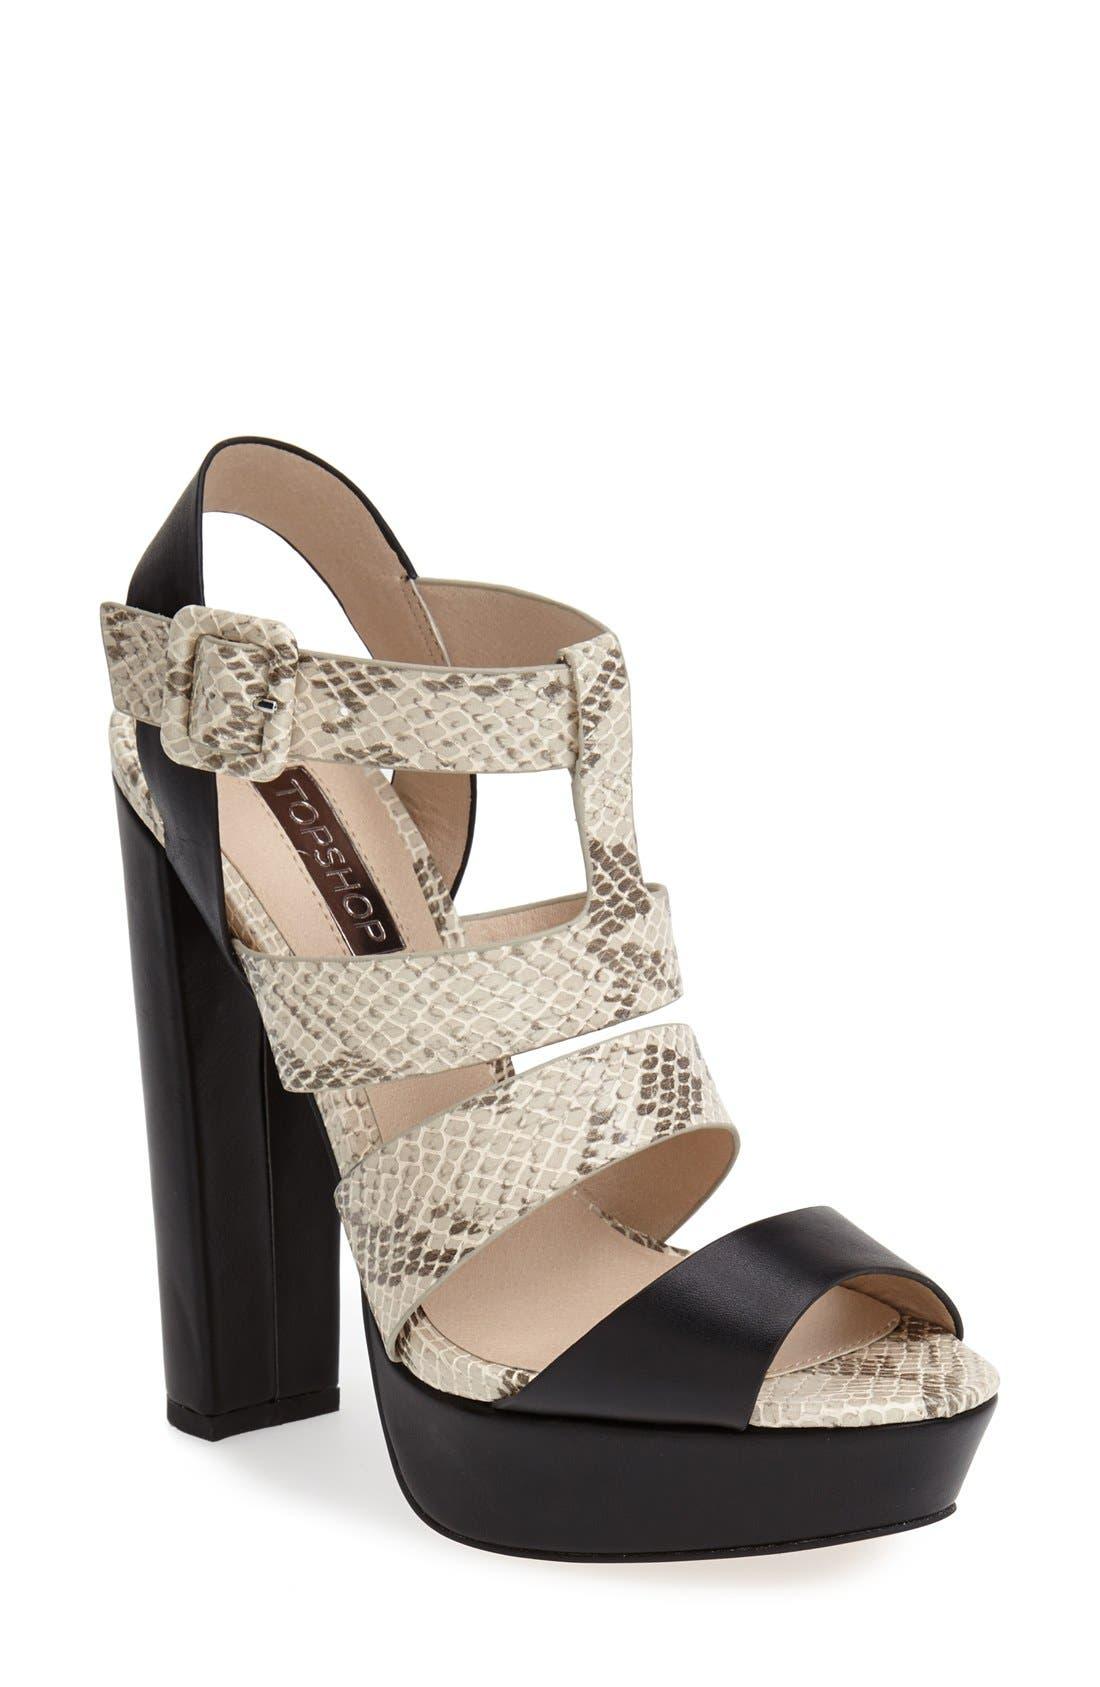 Alternate Image 1 Selected - Topshop 'Lucy' Gladiator Sandal (Women)